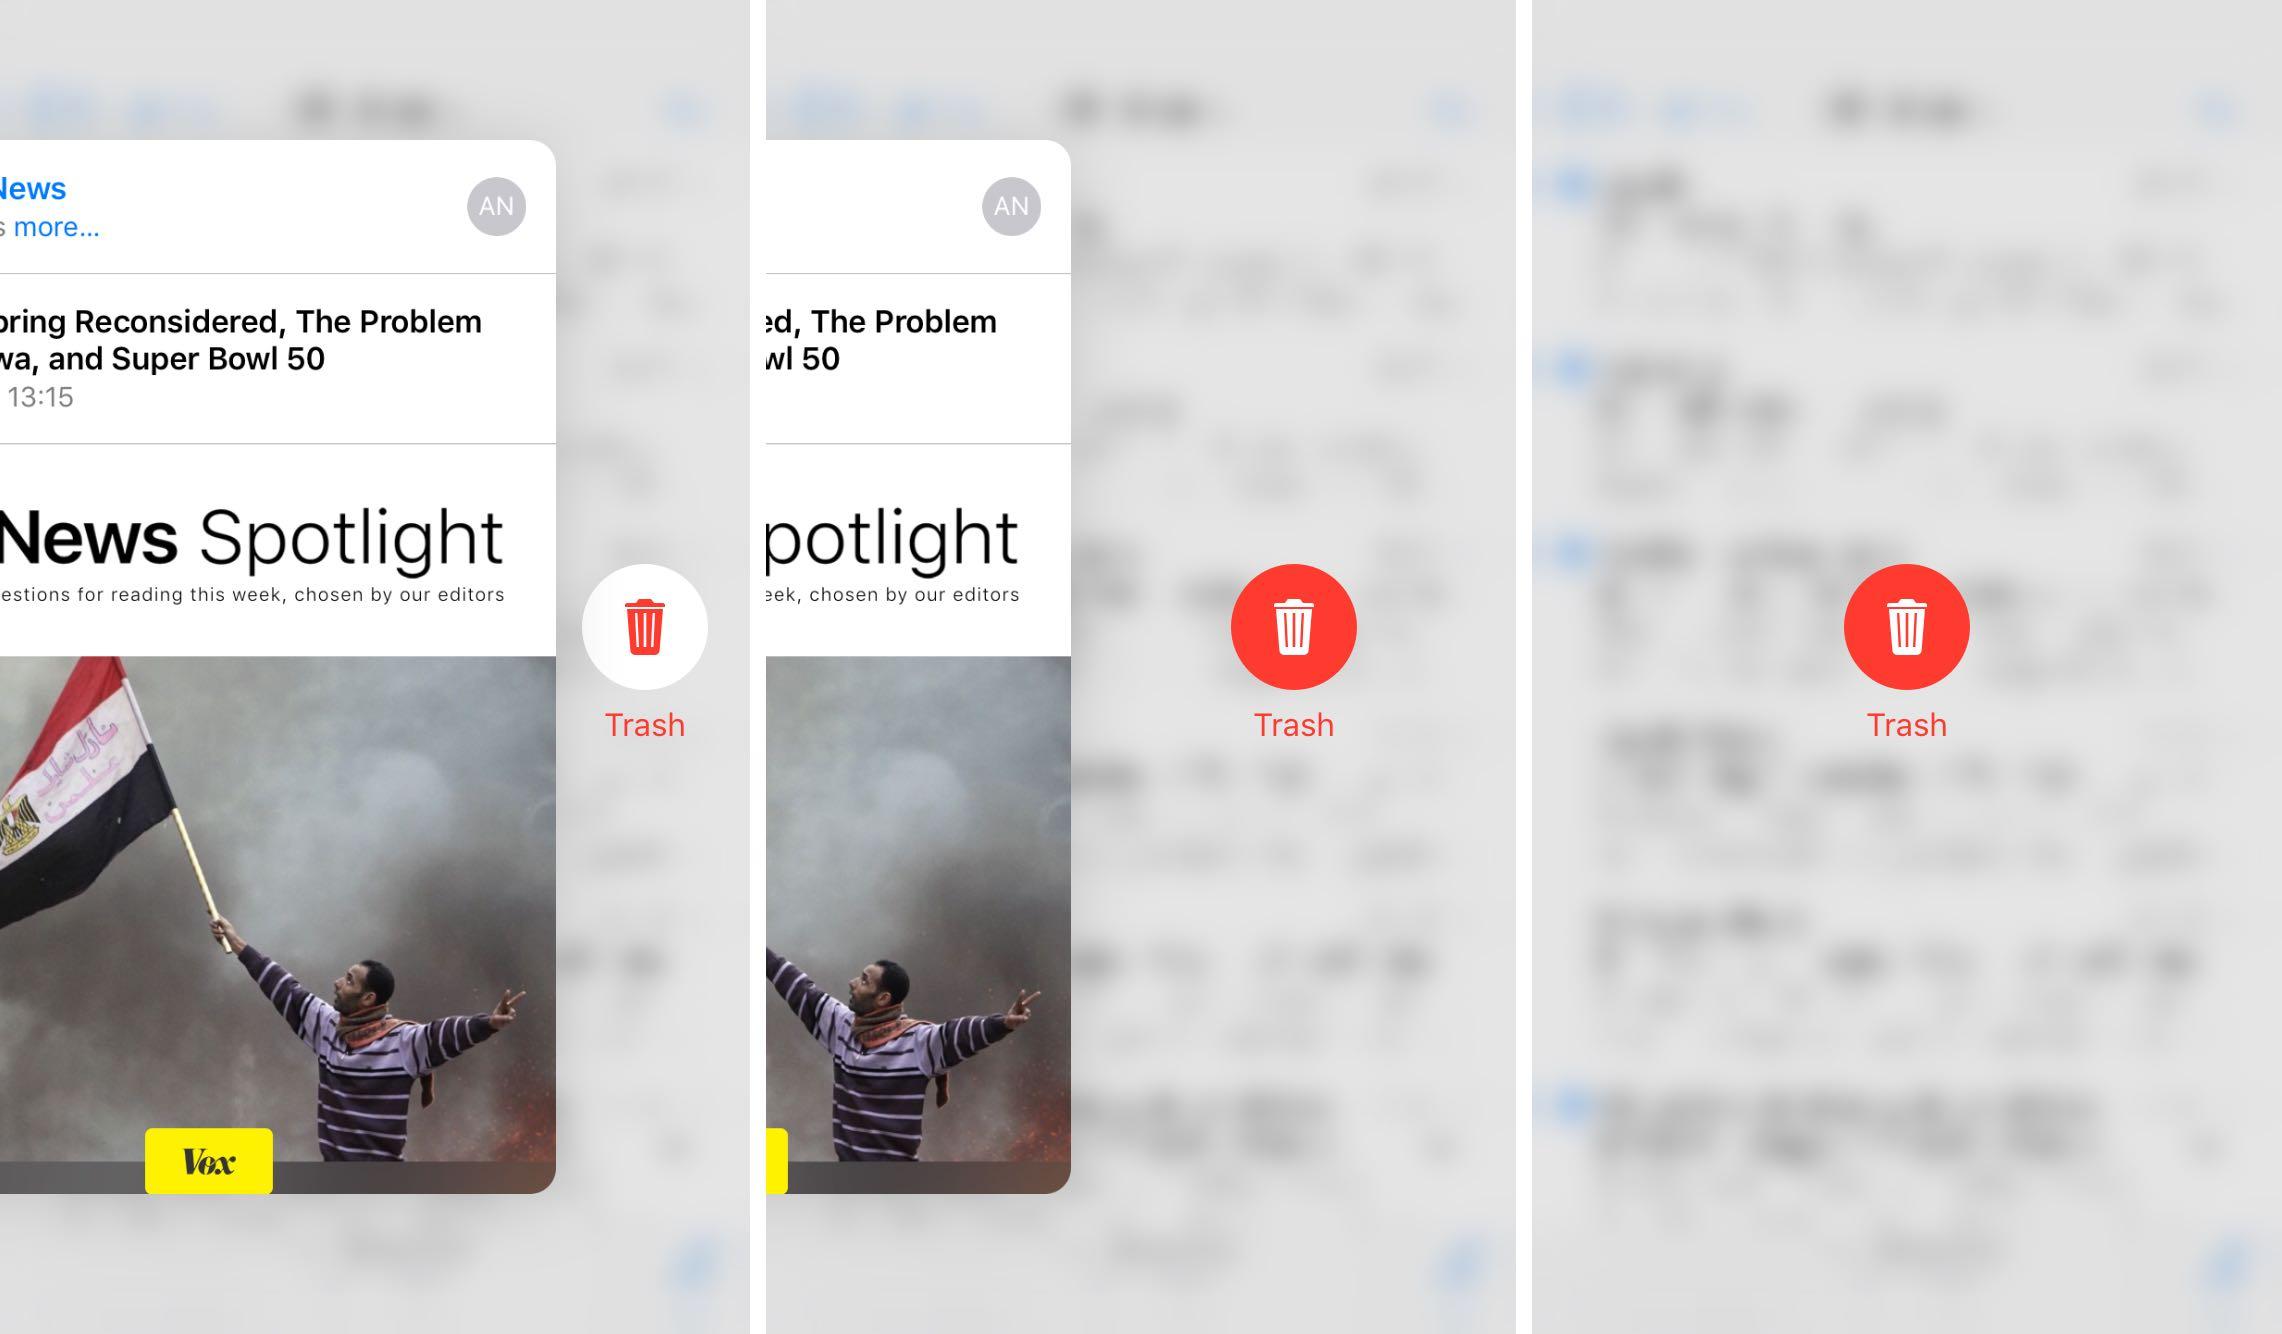 iOS 9 Mail 3D Touch acciones de correo electrónico basura iPhone 6s captura de pantalla 004